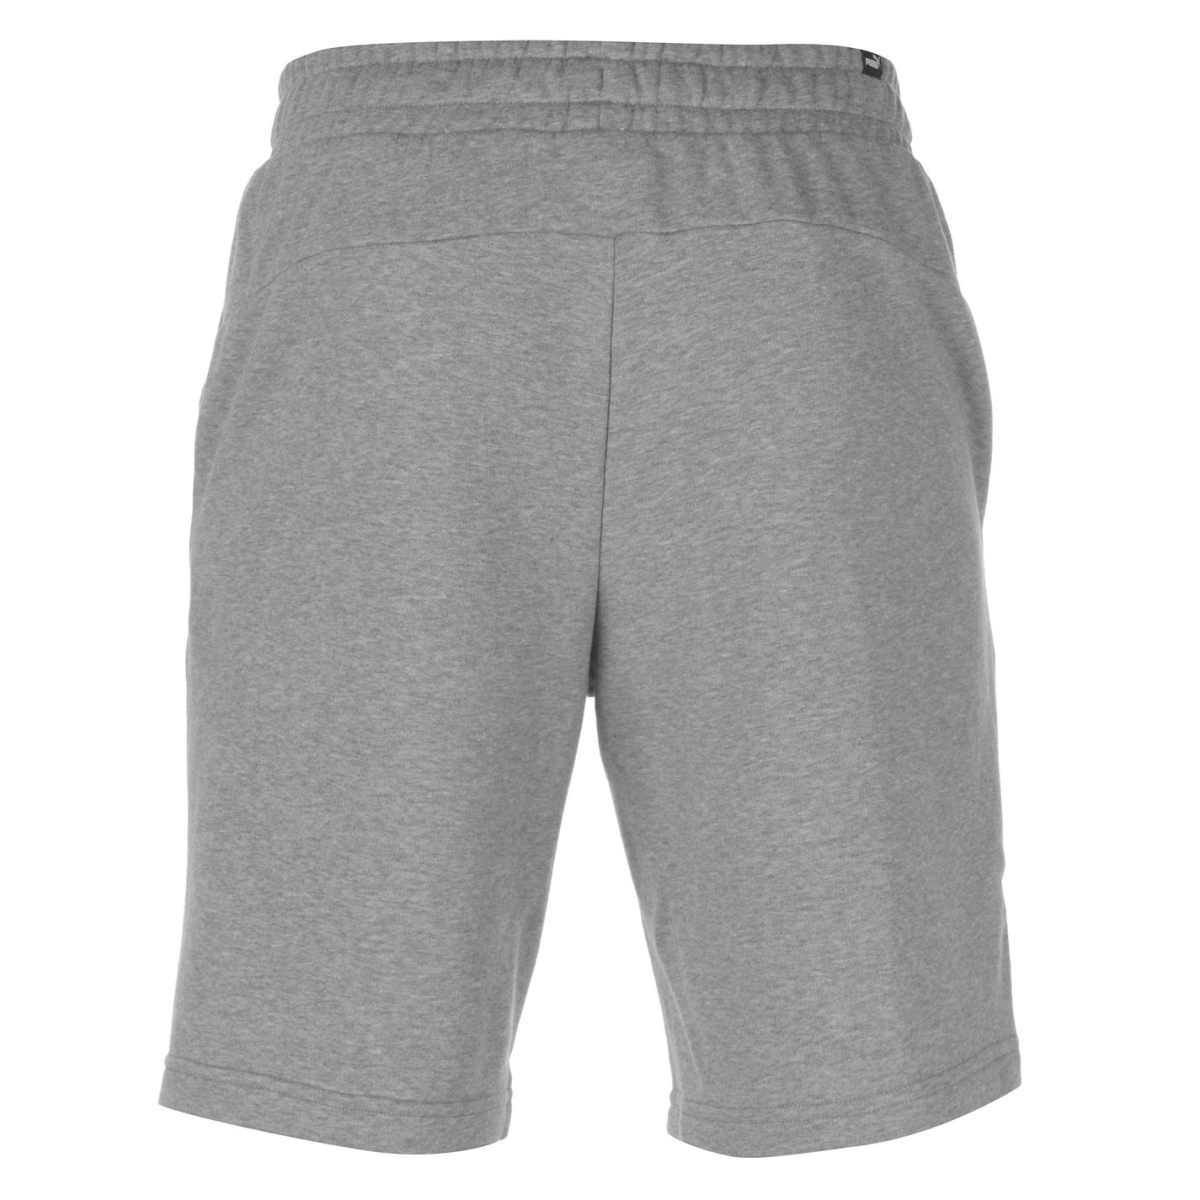 Puma No 1 Herren Shorts Sporthose Kurzhose Bermuda Sport